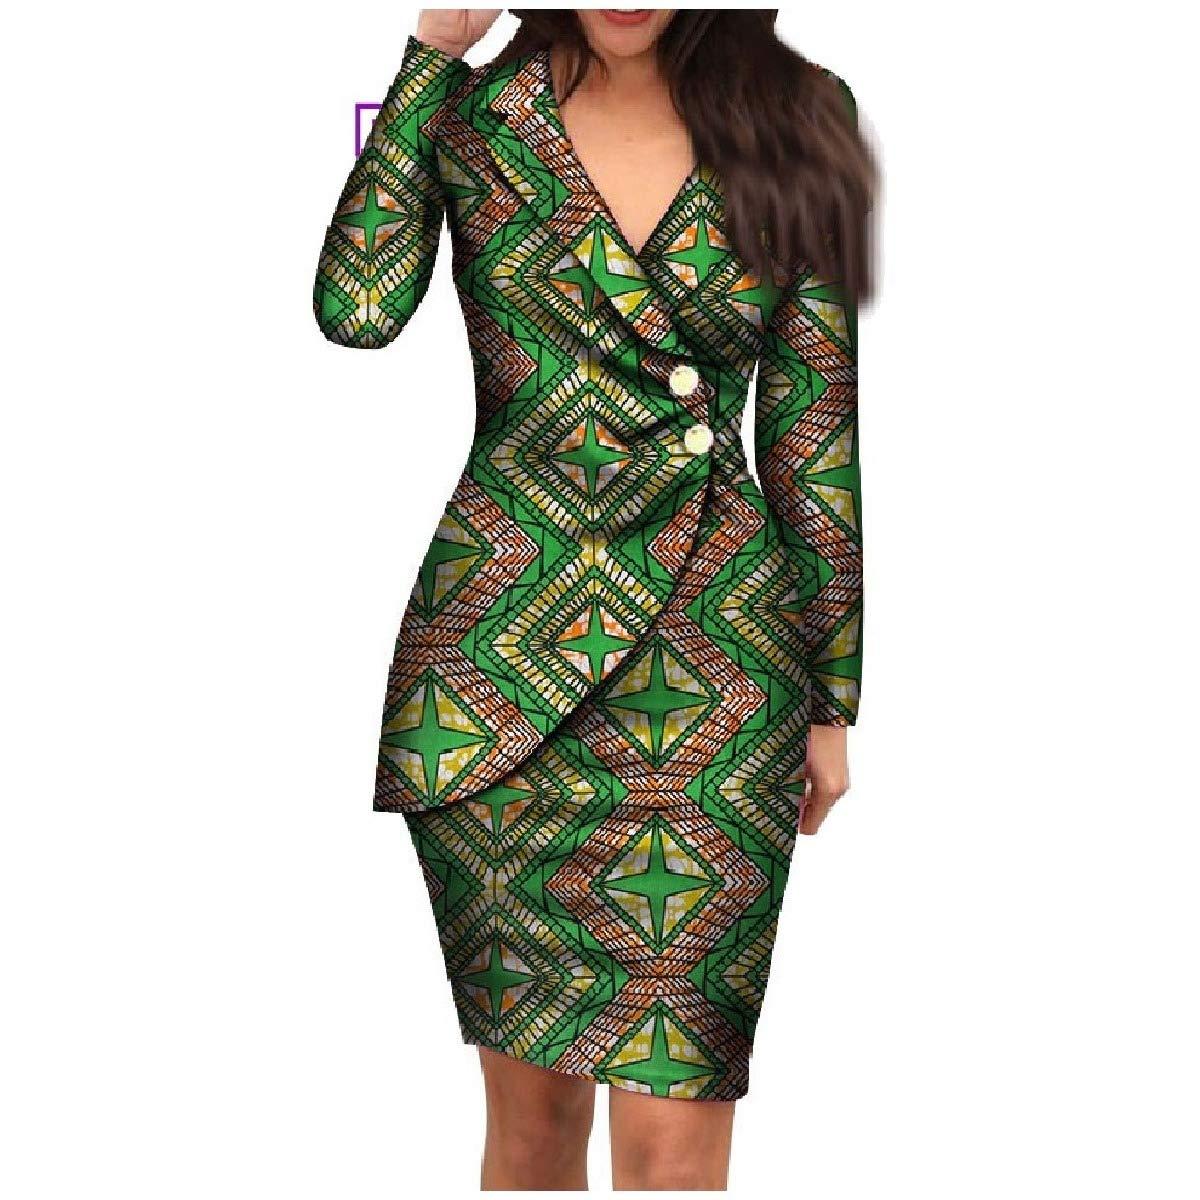 Dark Green HEFASDM Women's Dashiki Elegent Blazer African Printed Premium Back Cotton Dress